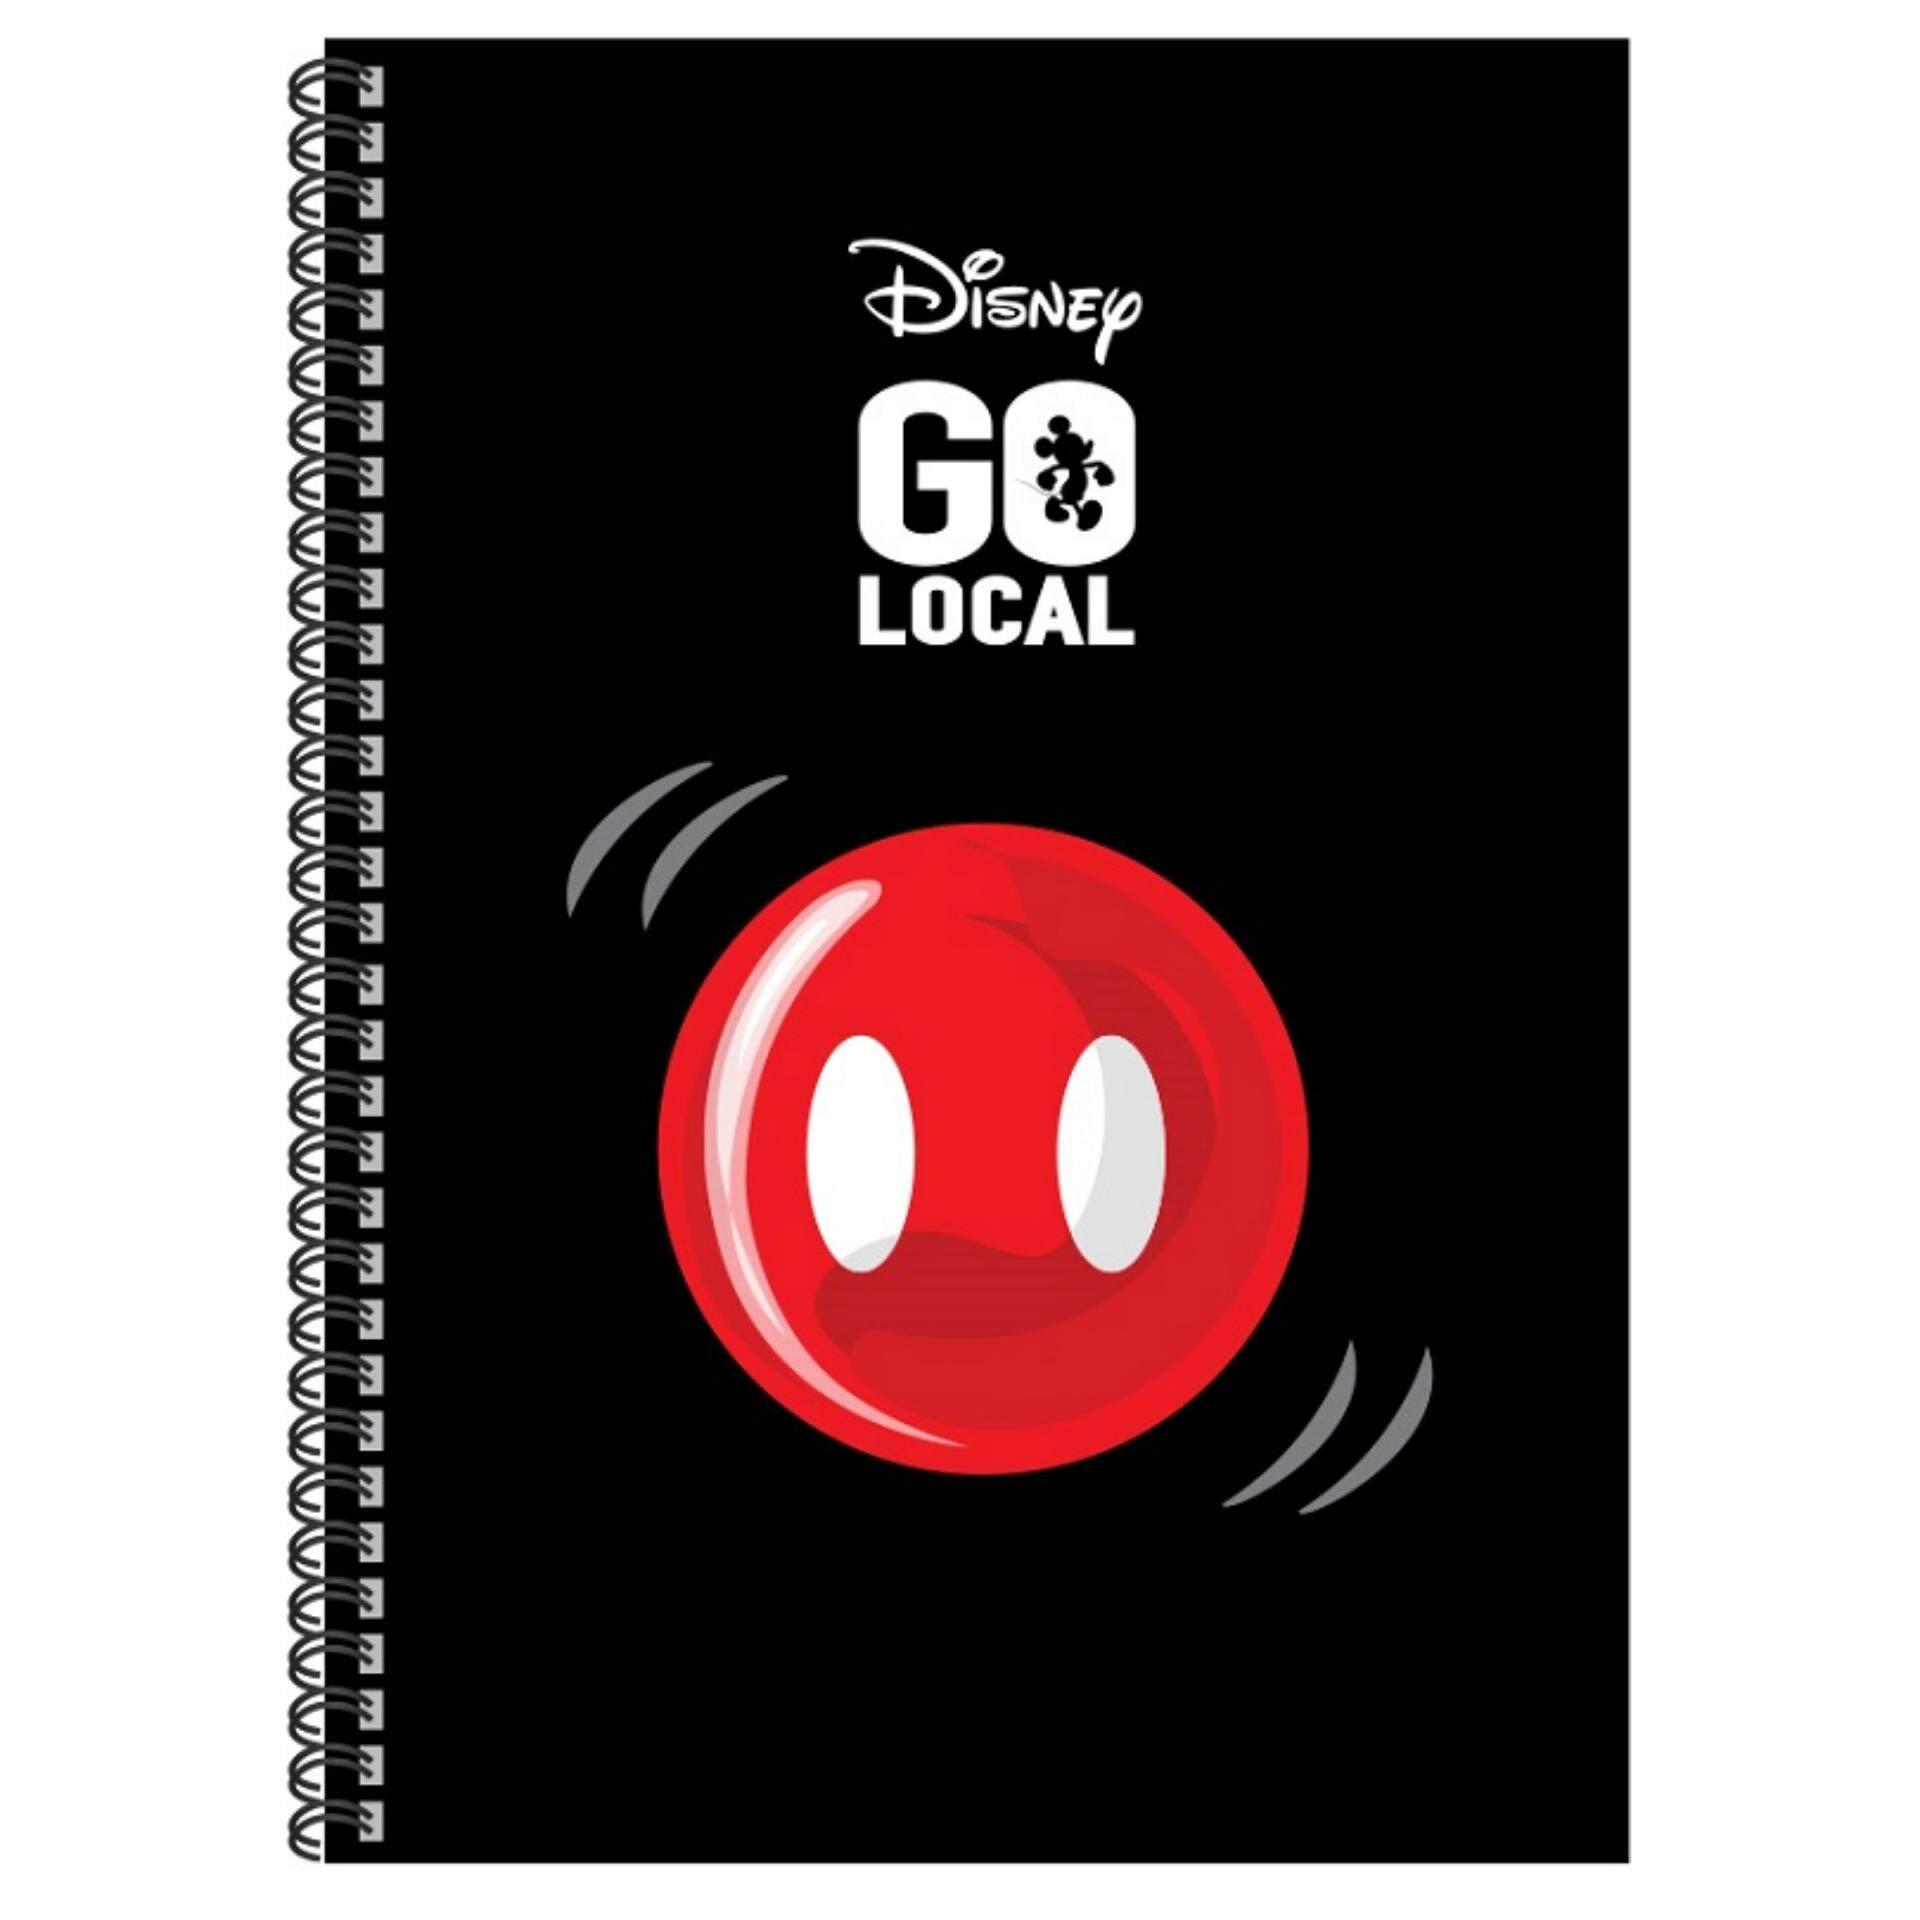 Disney Mickey Go Local A5 Hard Cover Notebook - Black Mickey